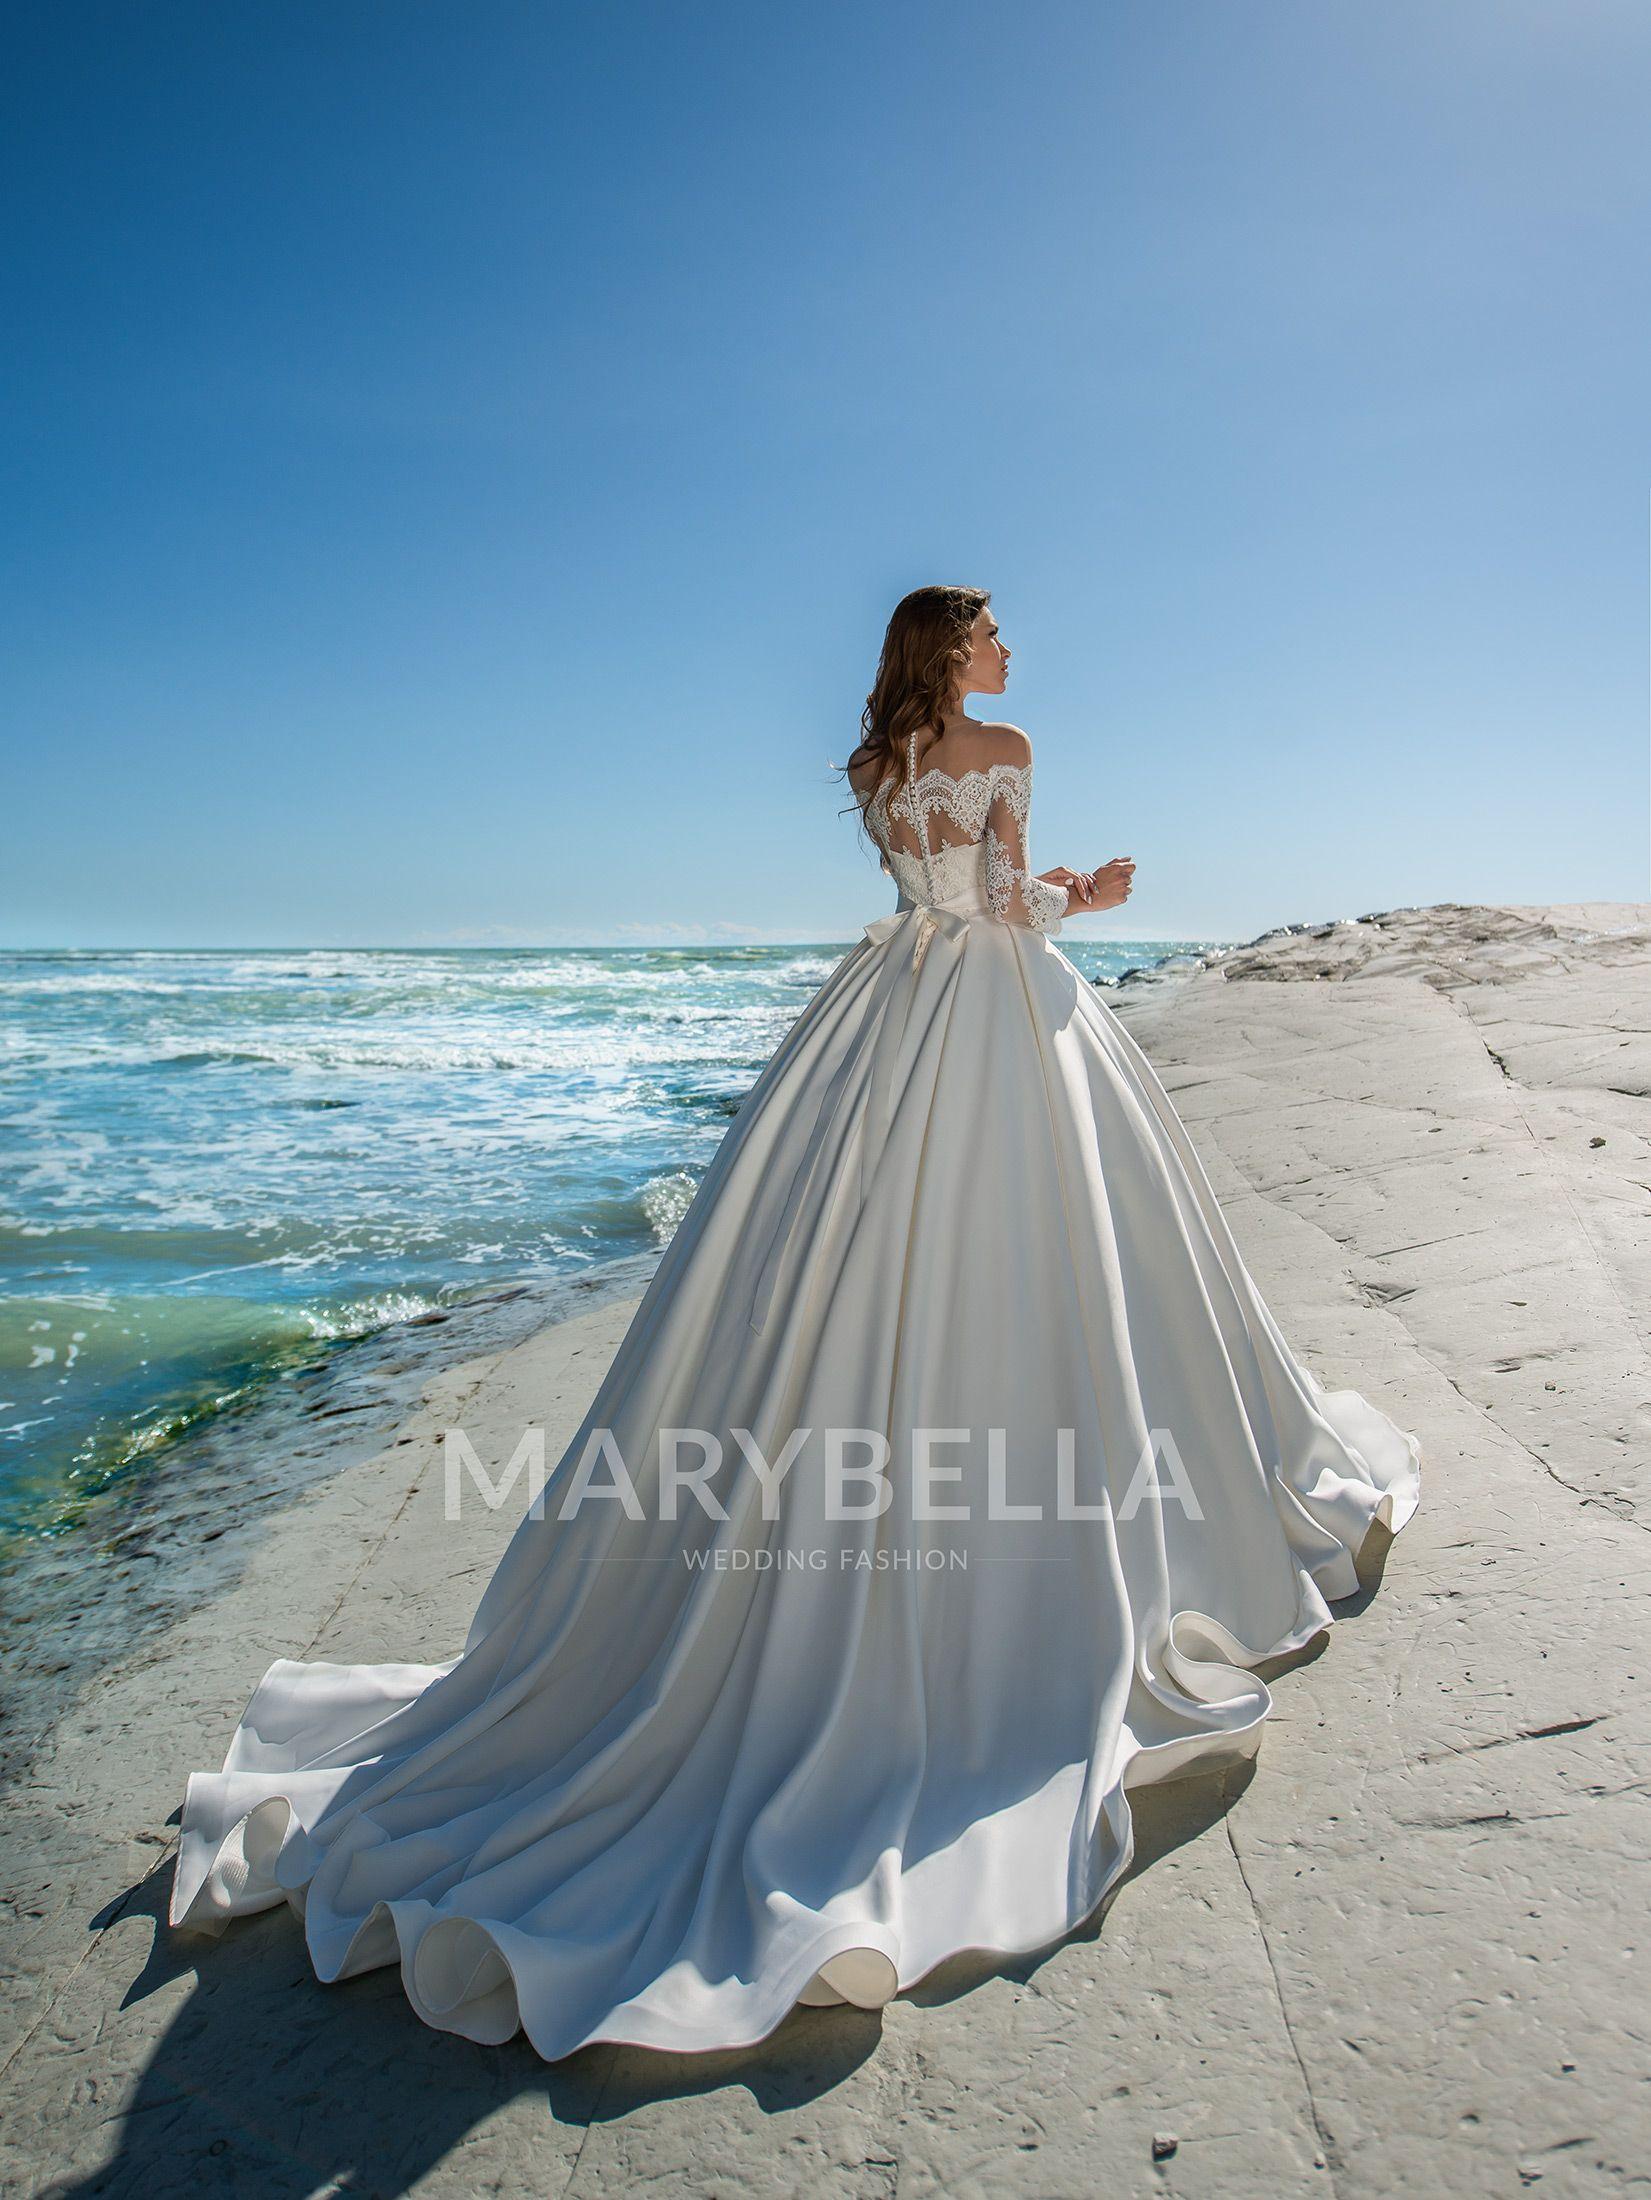 Pin by svetlana peer on girls in wedding dresses pinterest